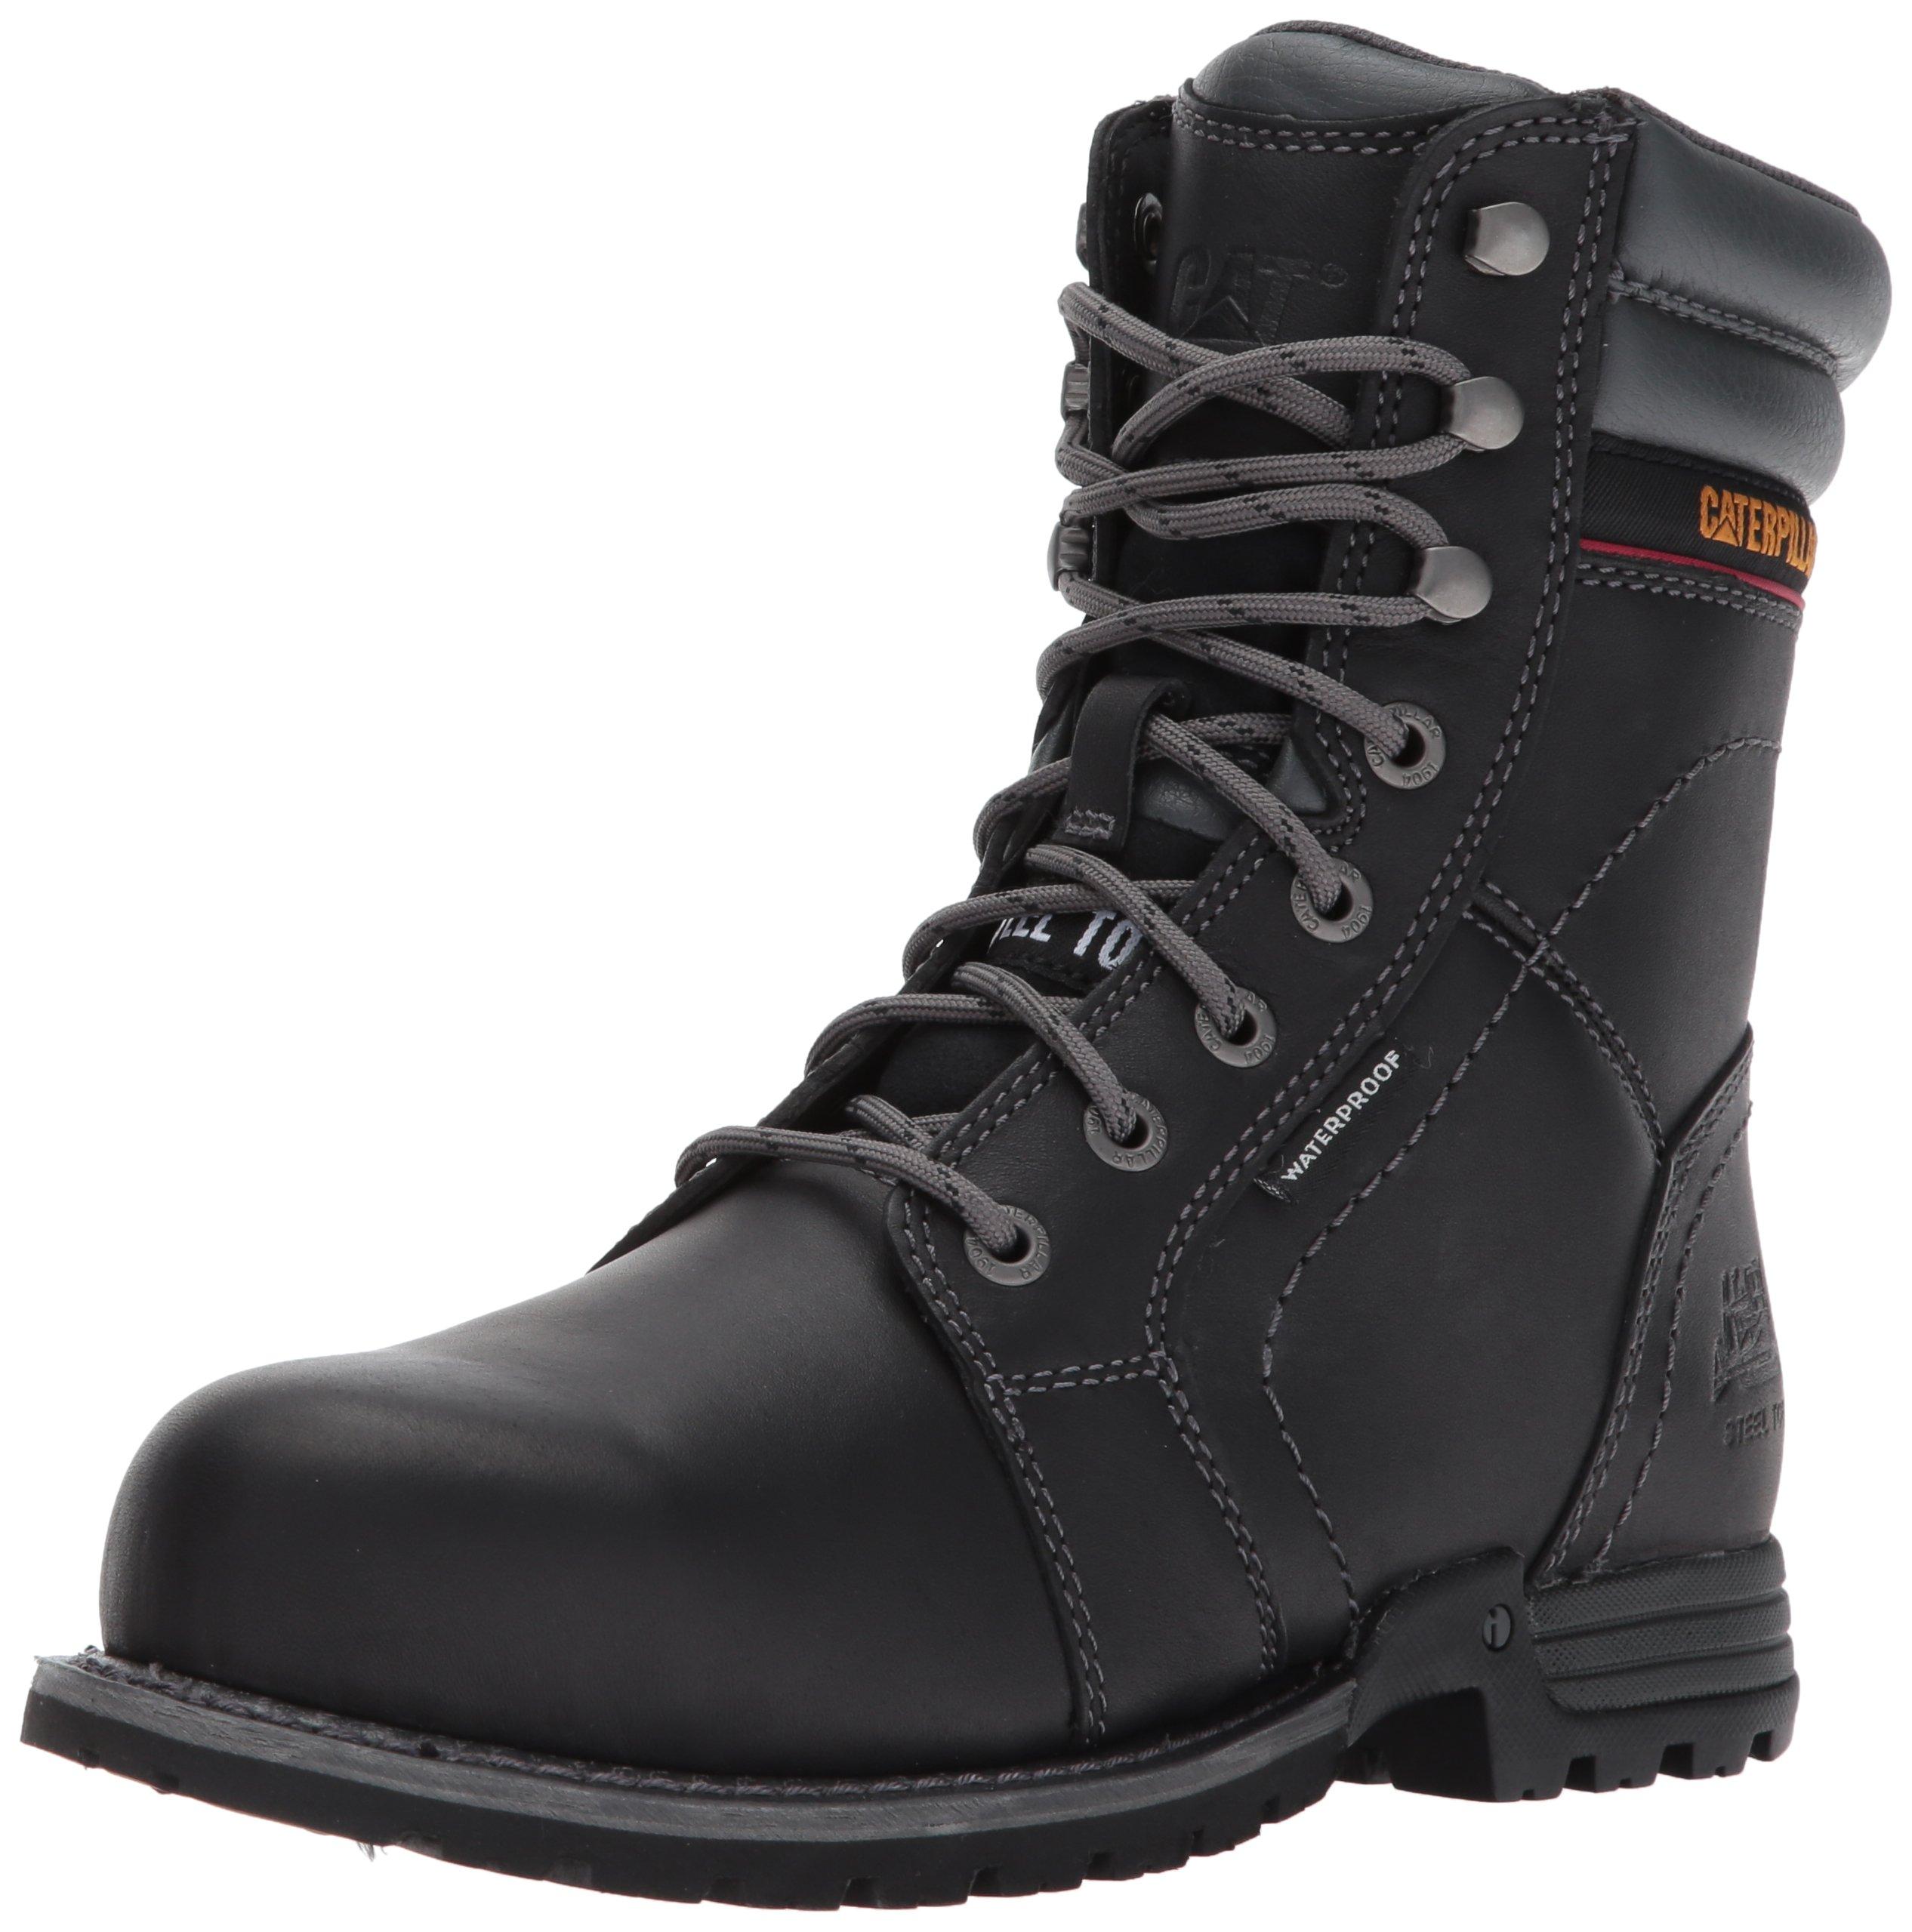 Caterpillar Women's Echo Waterproof Steel Toe Industrial and Construction Shoe, Black, 7.5 M US by Caterpillar